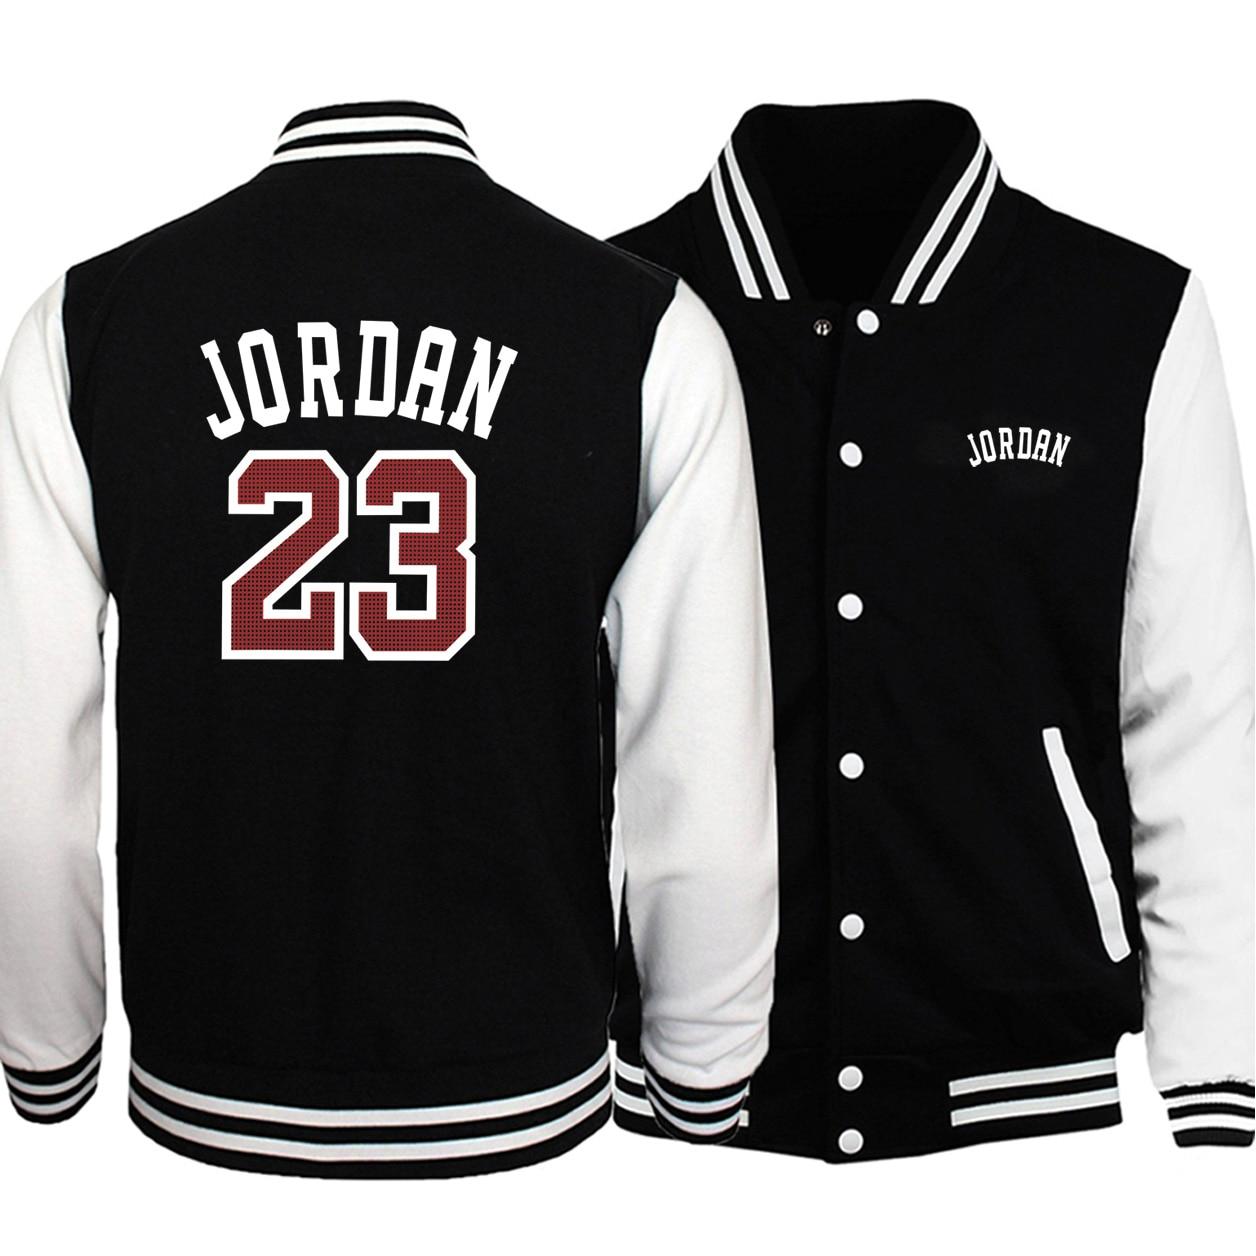 Hot Sale Men Baseball Uniform Coat 2019 Autumn Bomber Jacket Jordan 23 Print Streetwear Casual Tracksuit Hip Hot Men Brand Coats 1